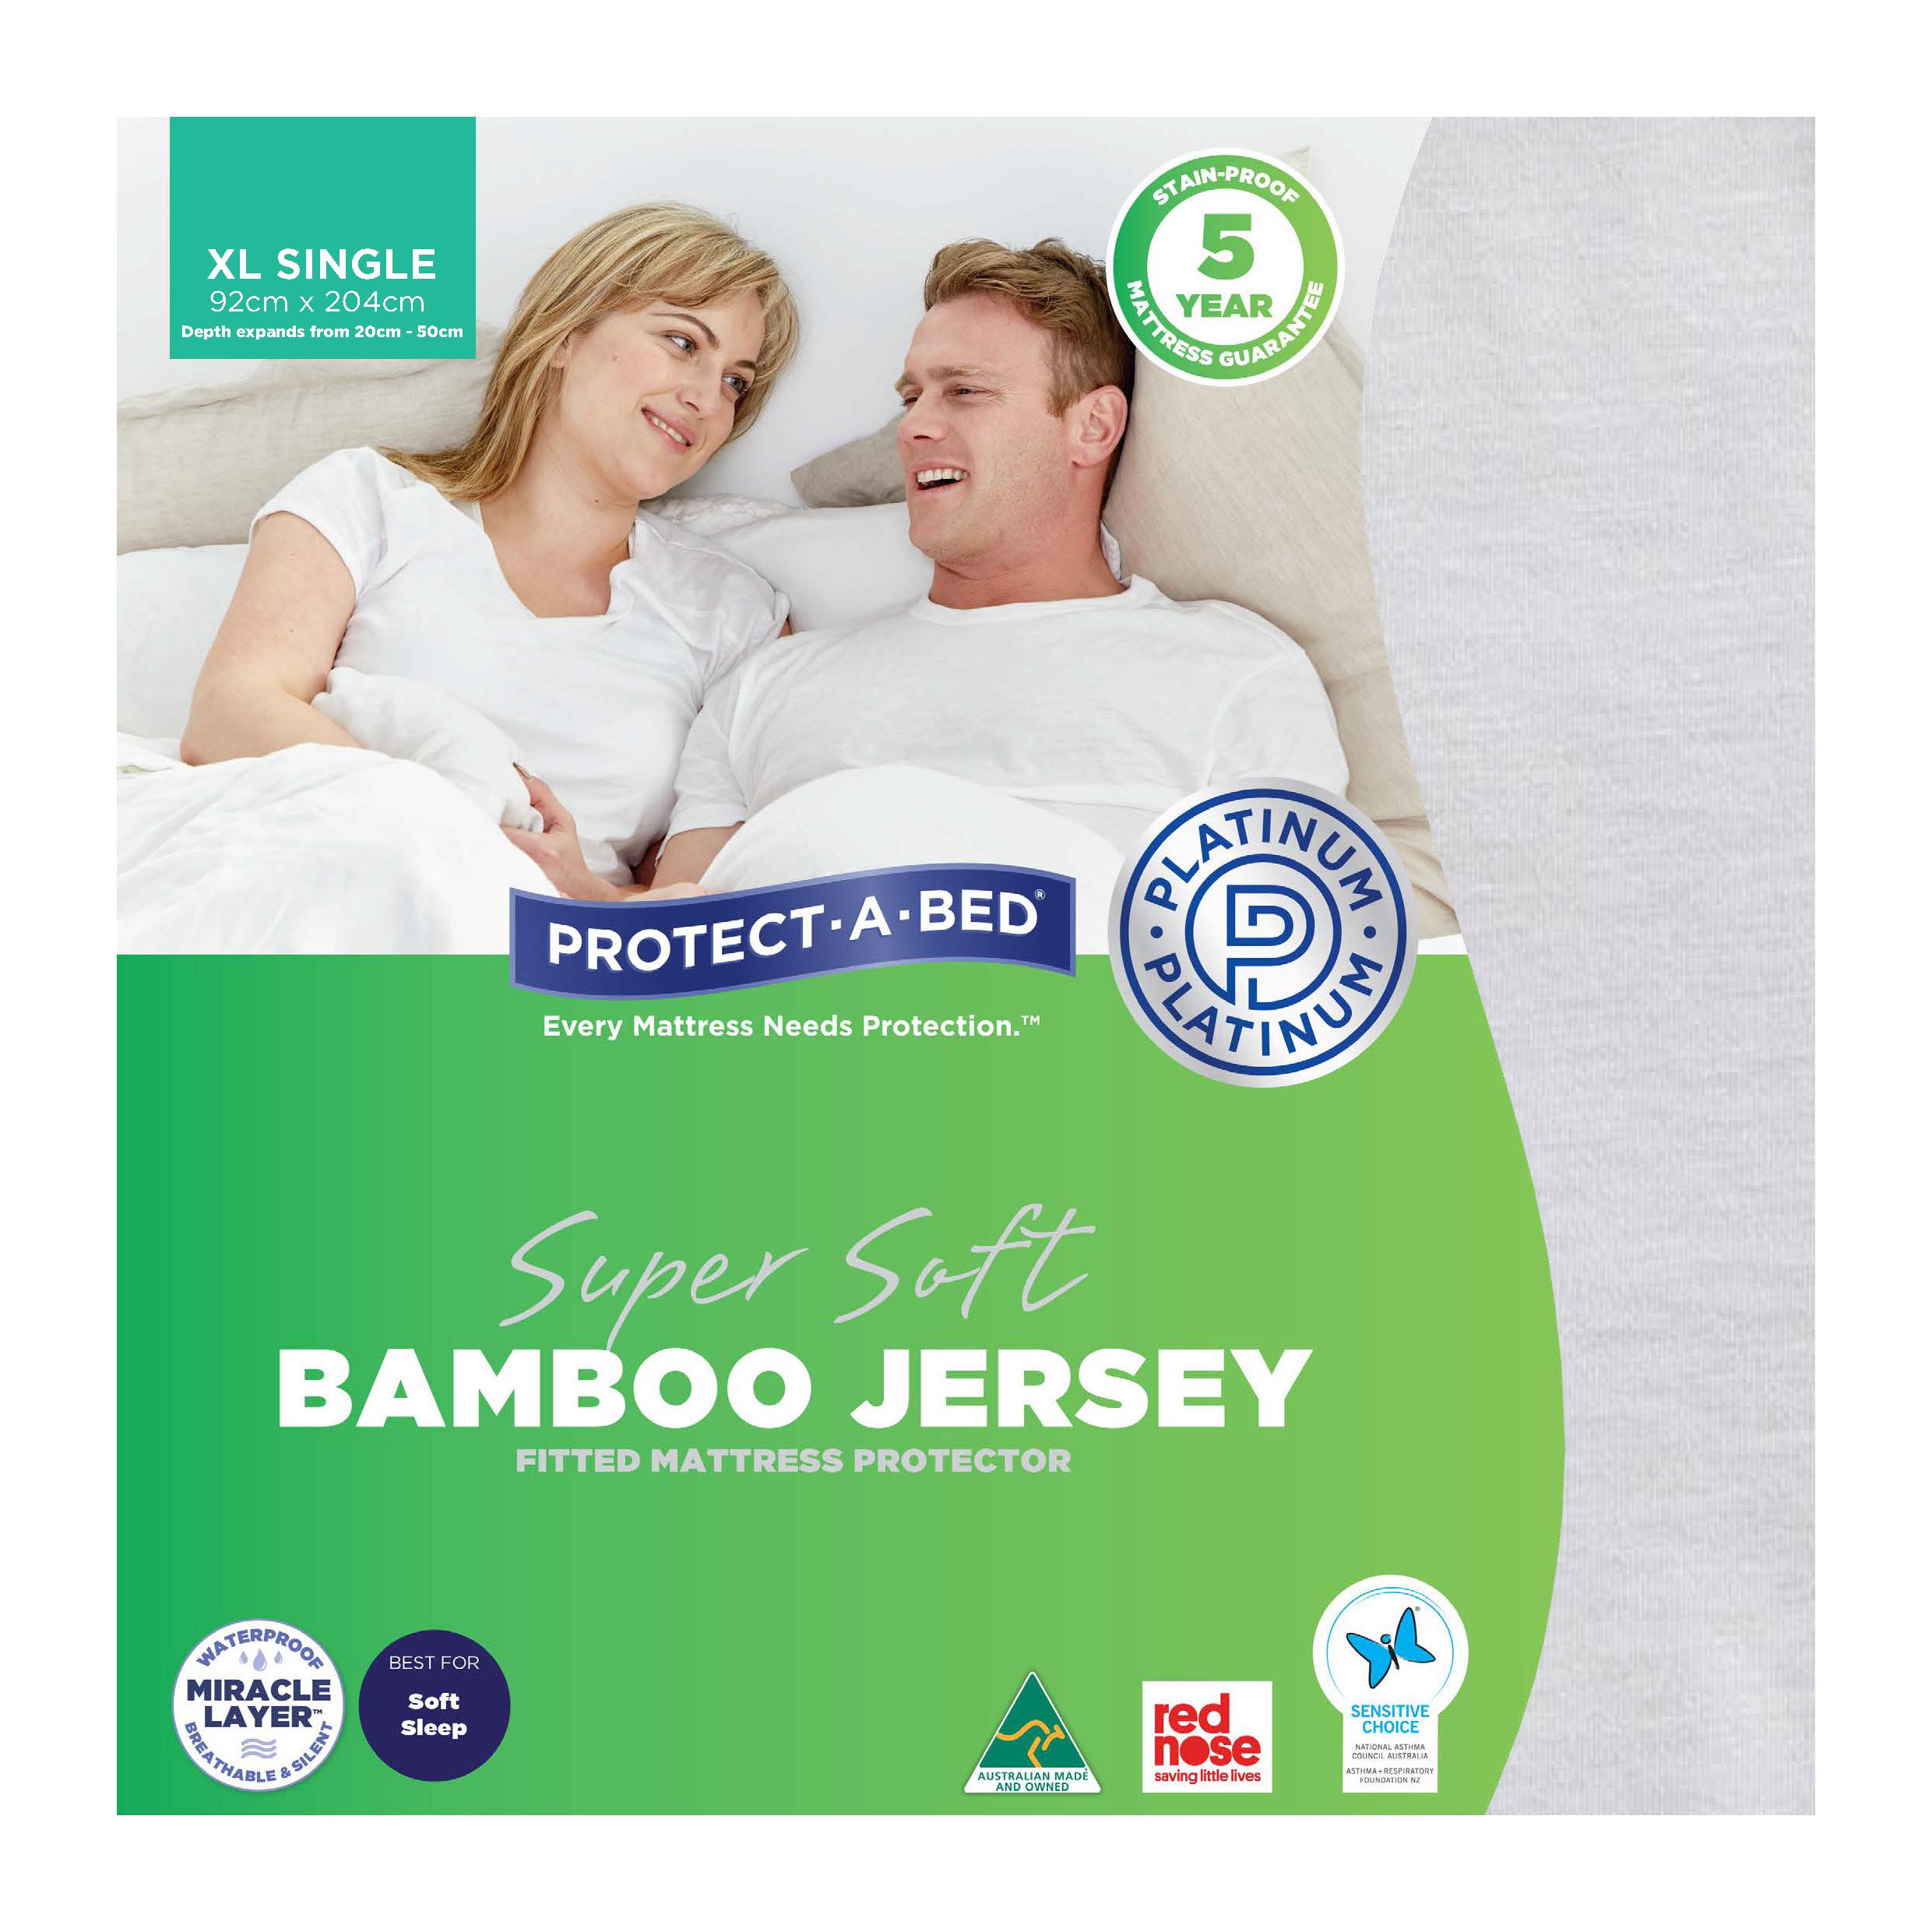 Protect-A-Bed Bamboo Jersey – Long Single Mattress Protector